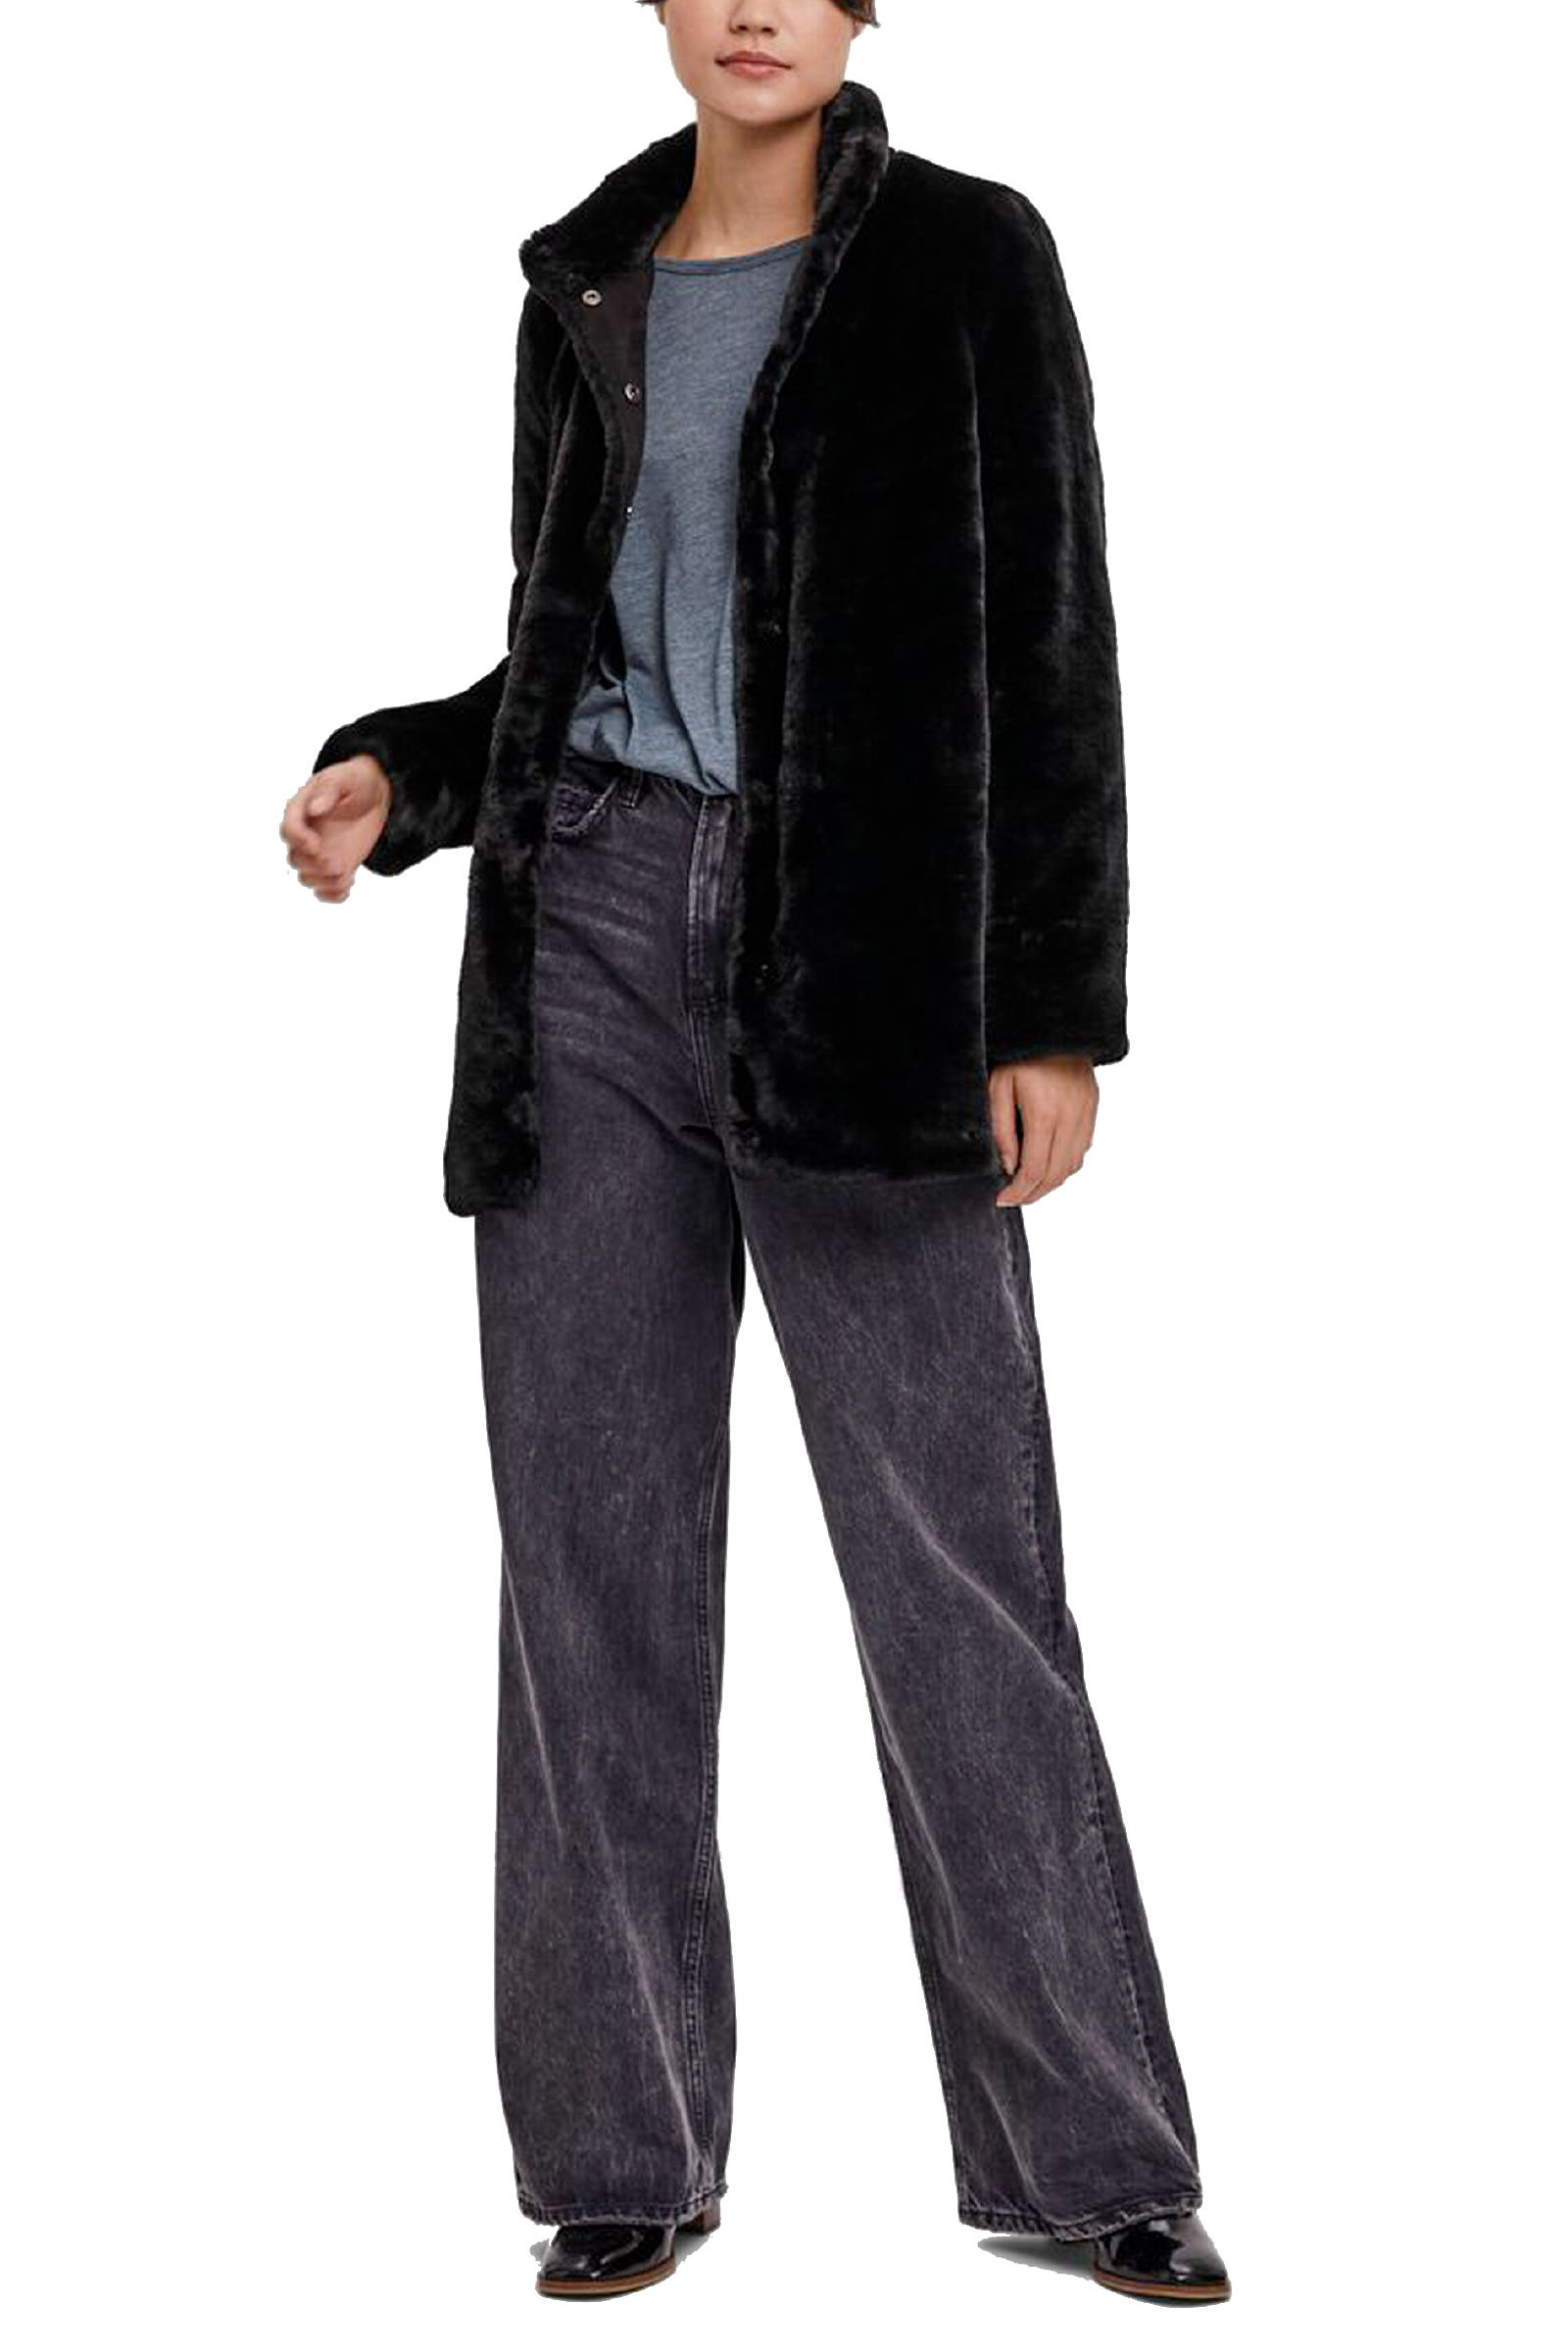 Women's Jacket VERO MODA | Jacket | 10235835Black